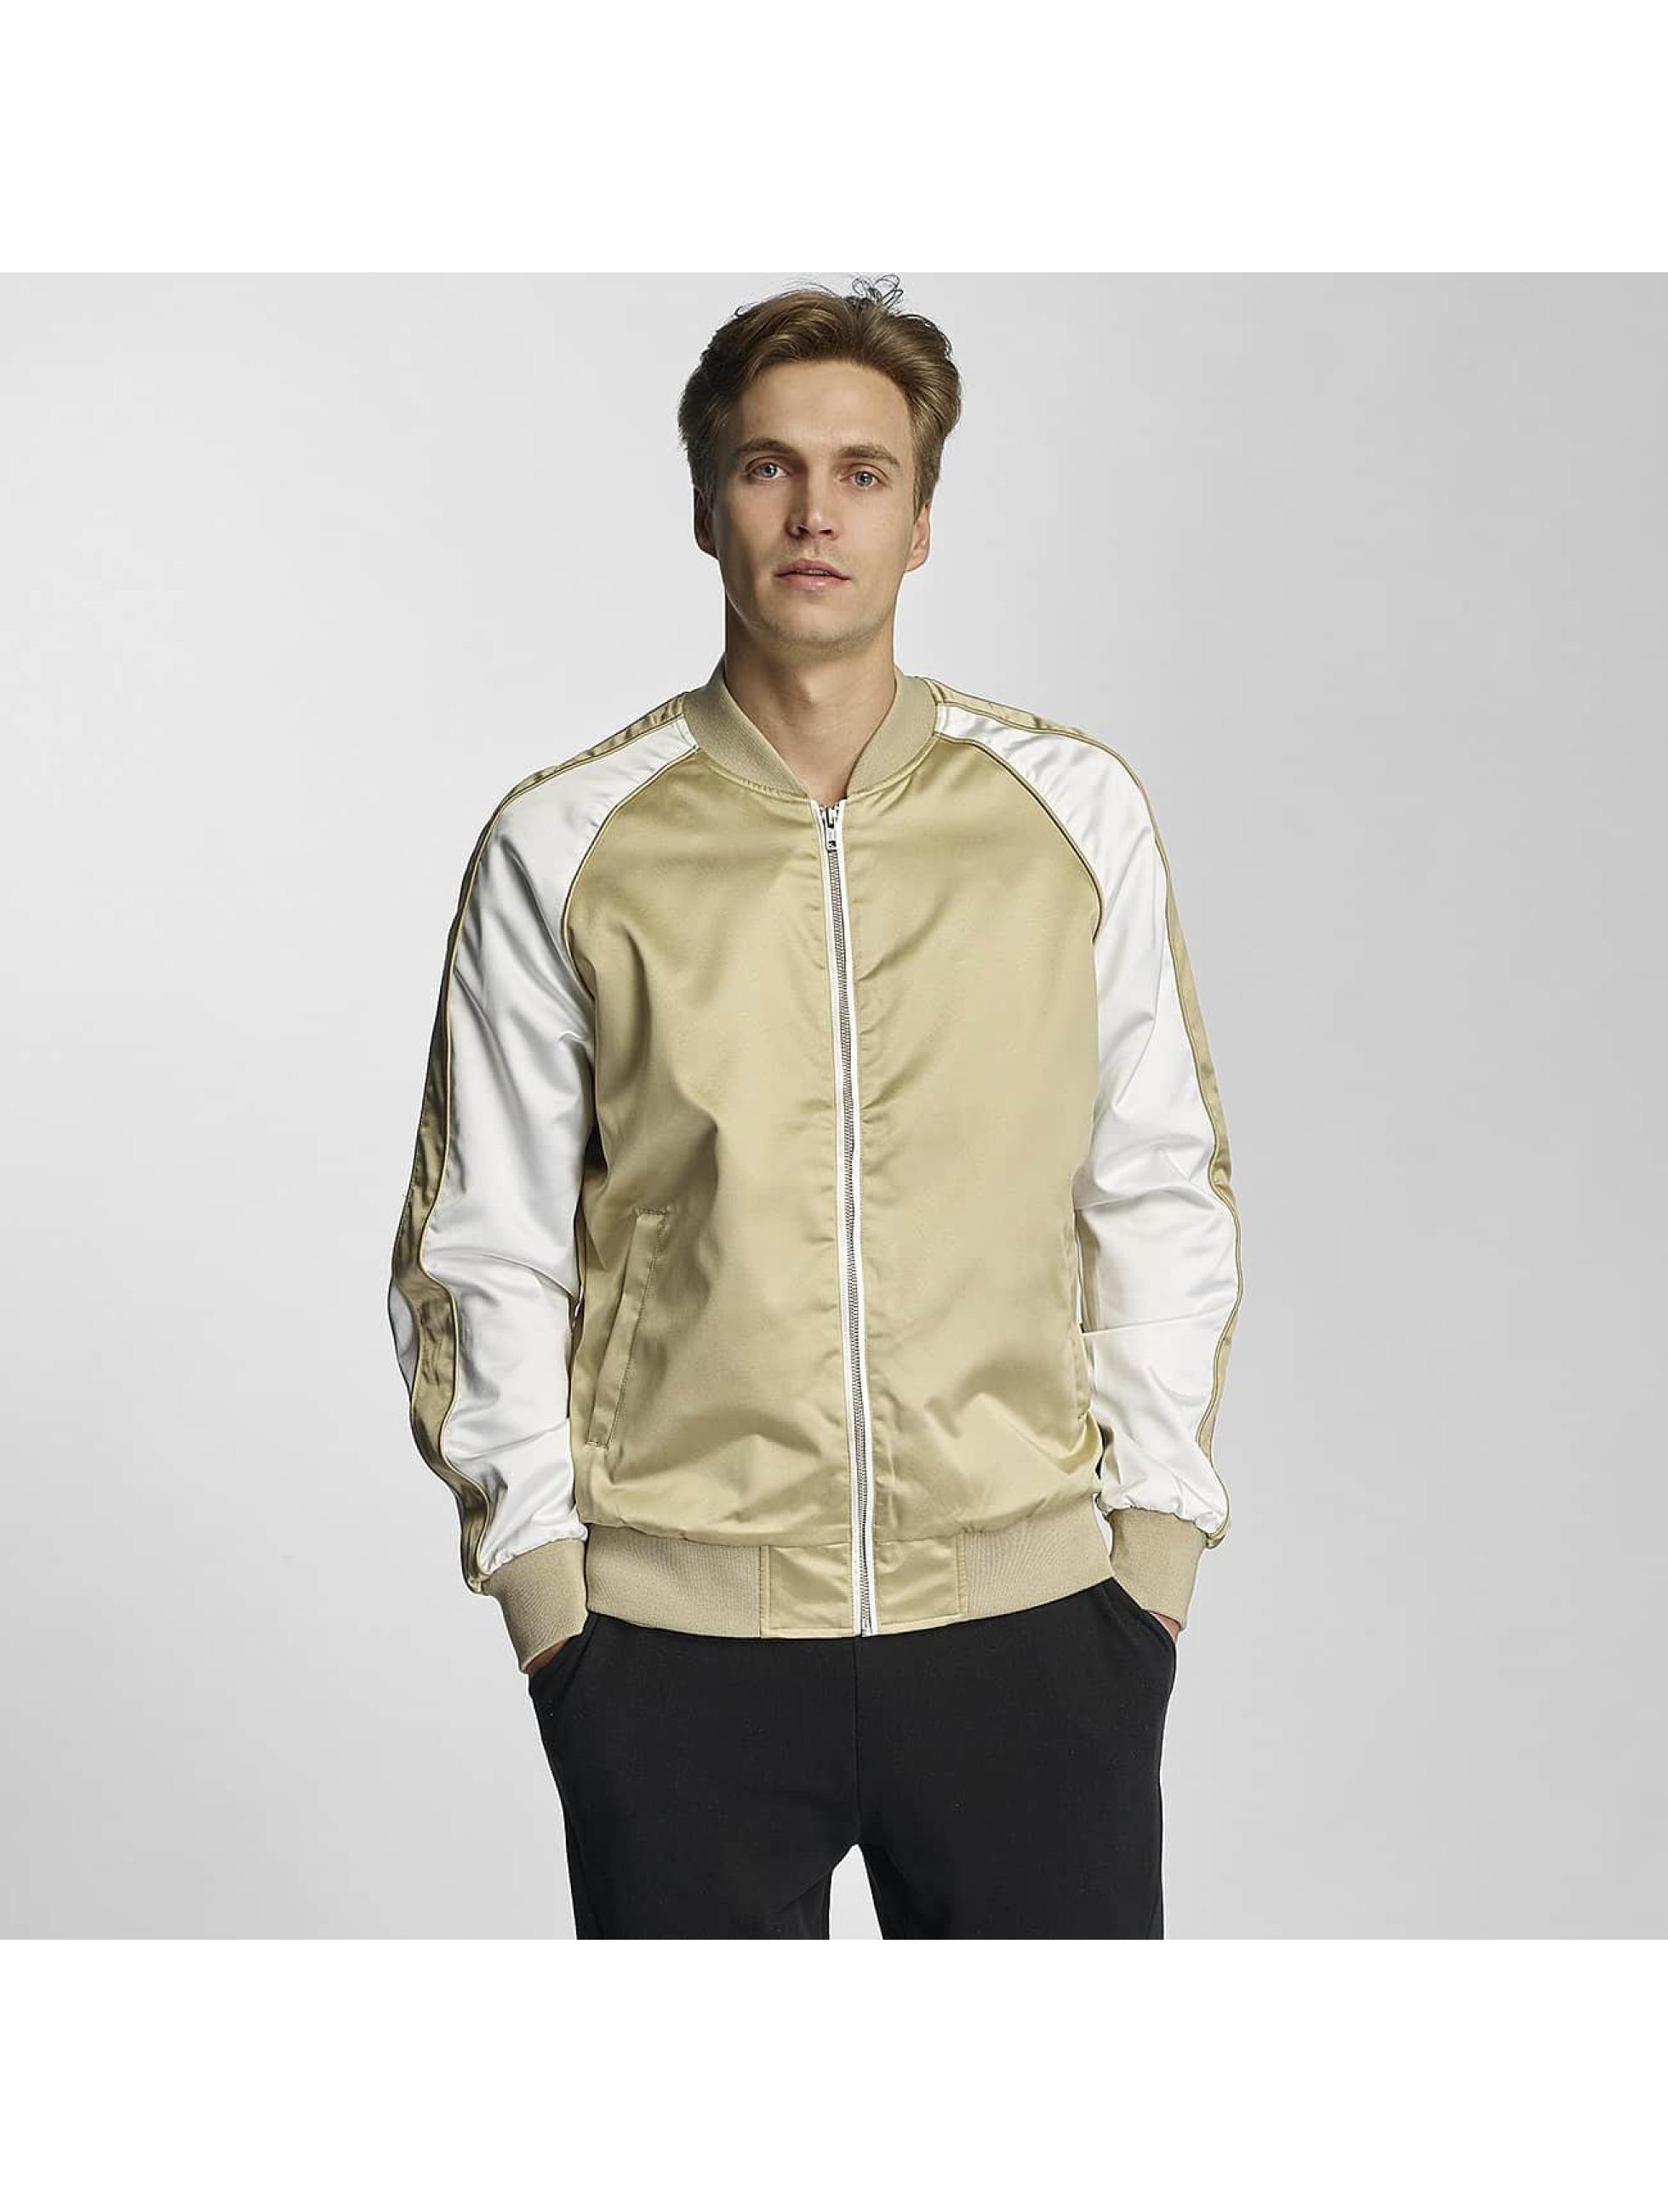 Urban Classics Lightweight Jacket Souvenier gold colored